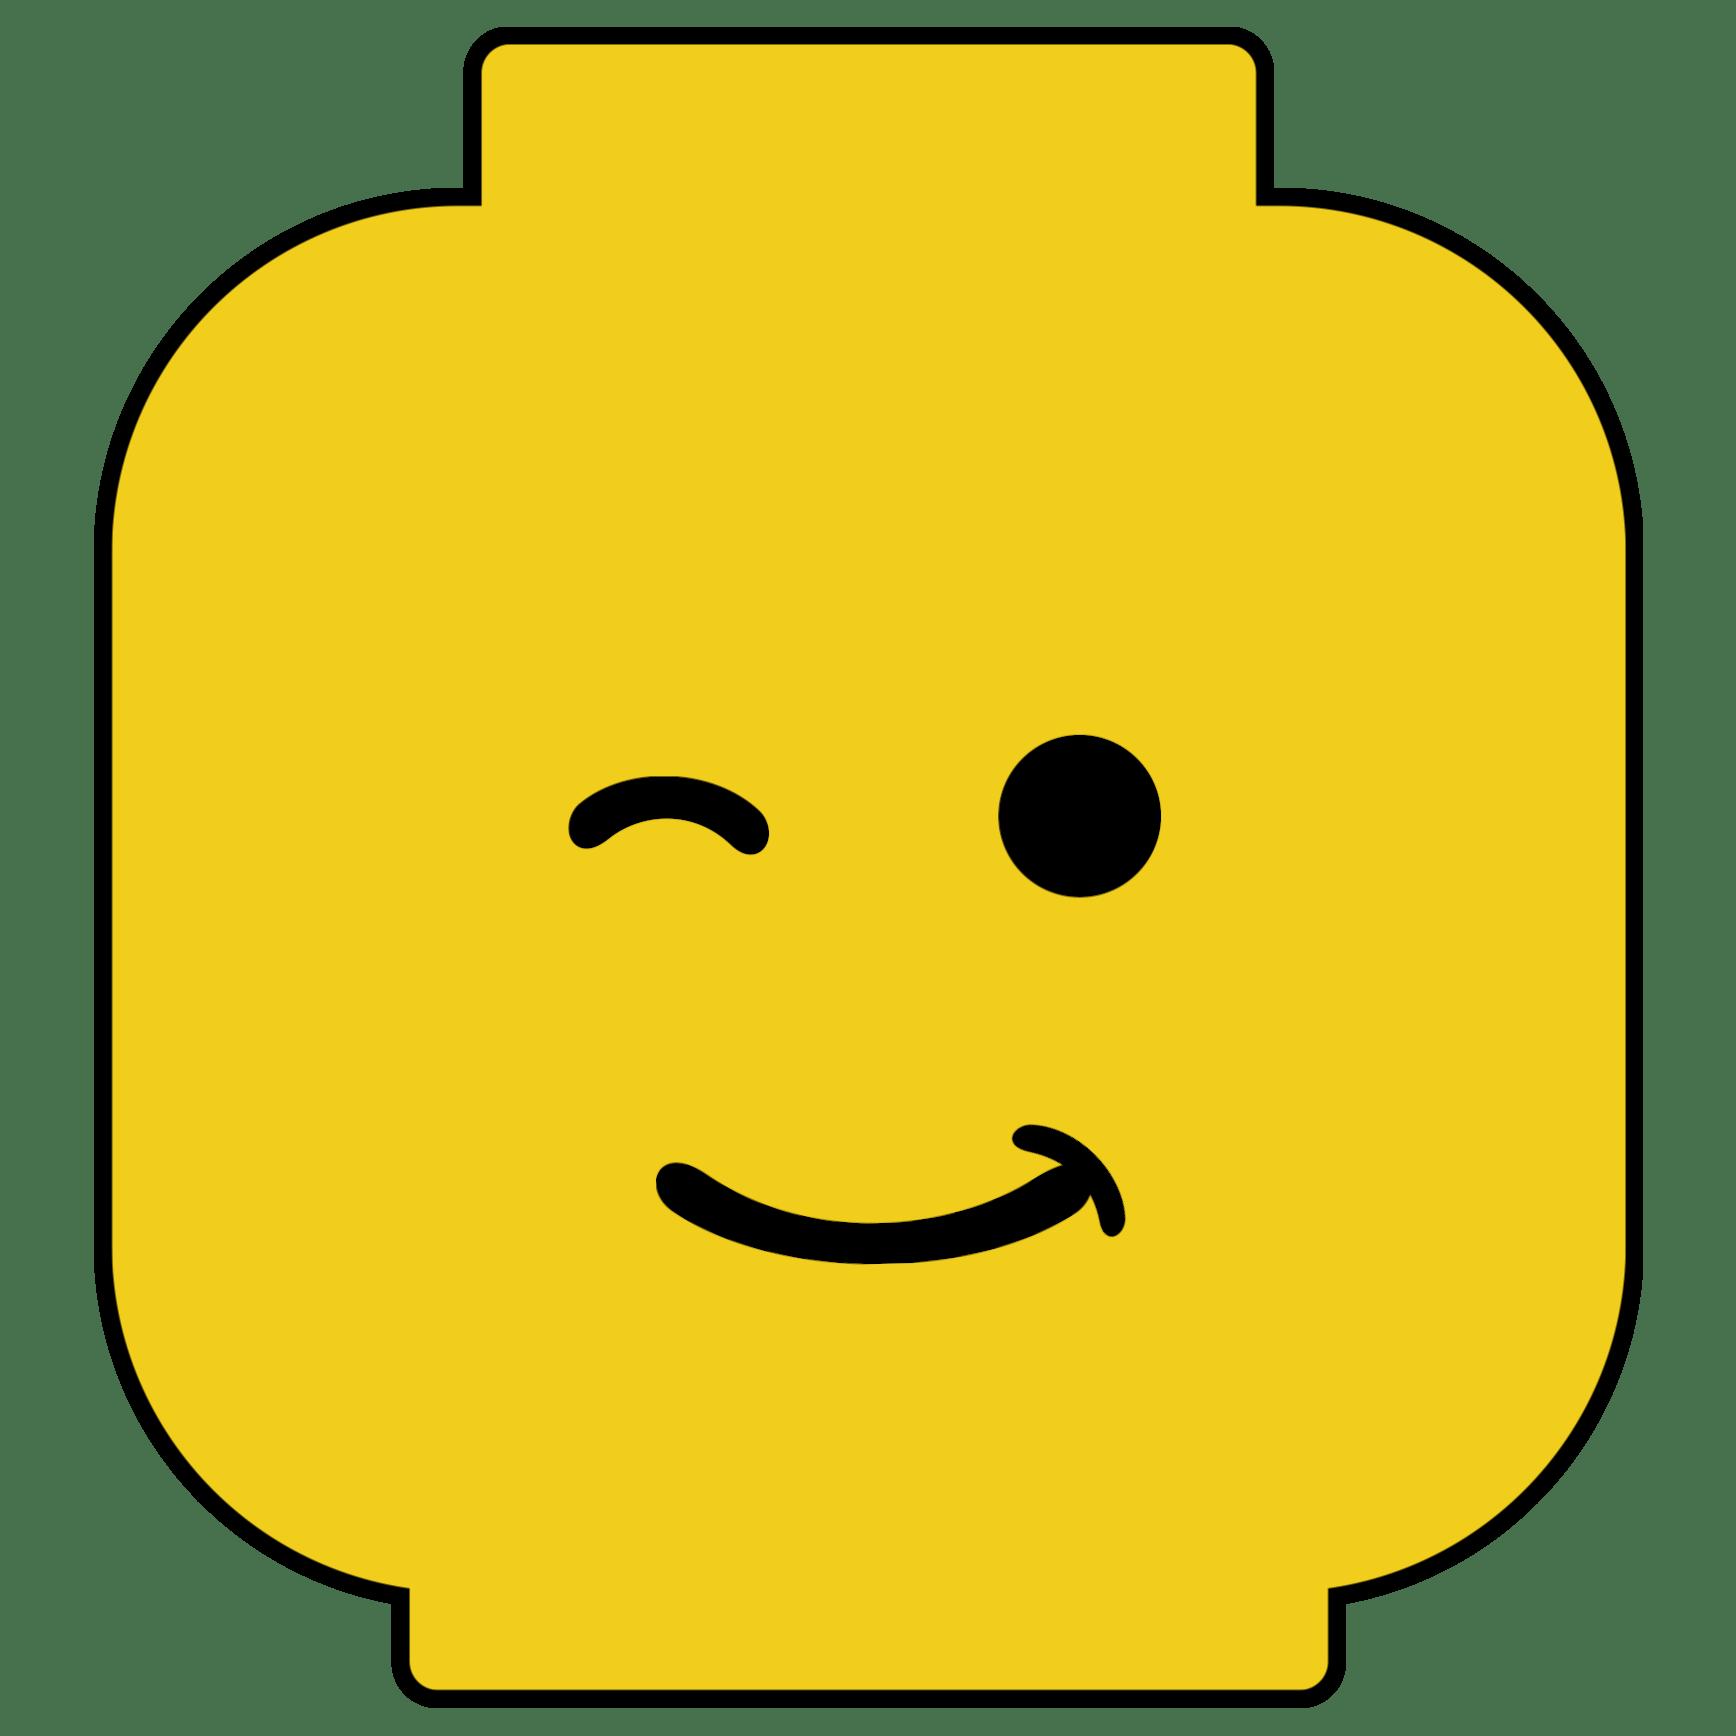 1736x1736 Lego Man Face Template